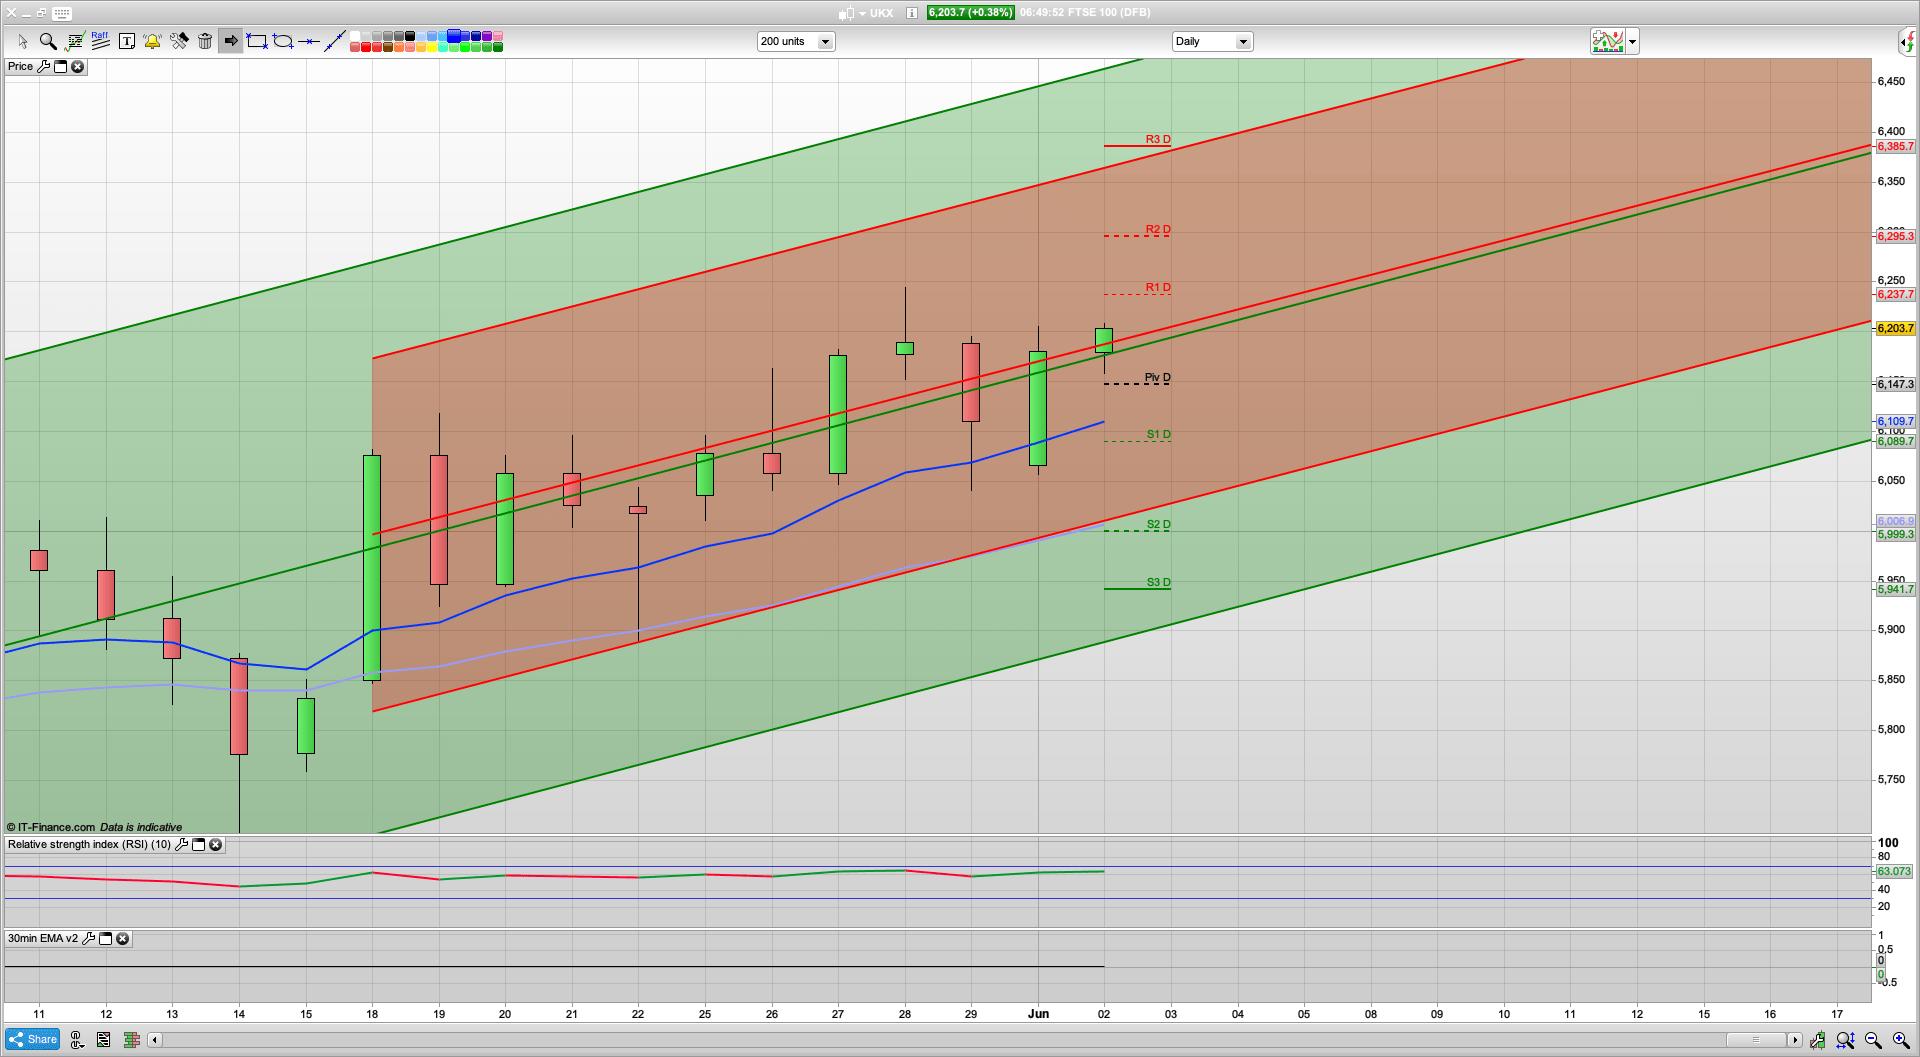 Bulls break 6200 with 6235 6280 next resistance   6150 support   3100 SPX?